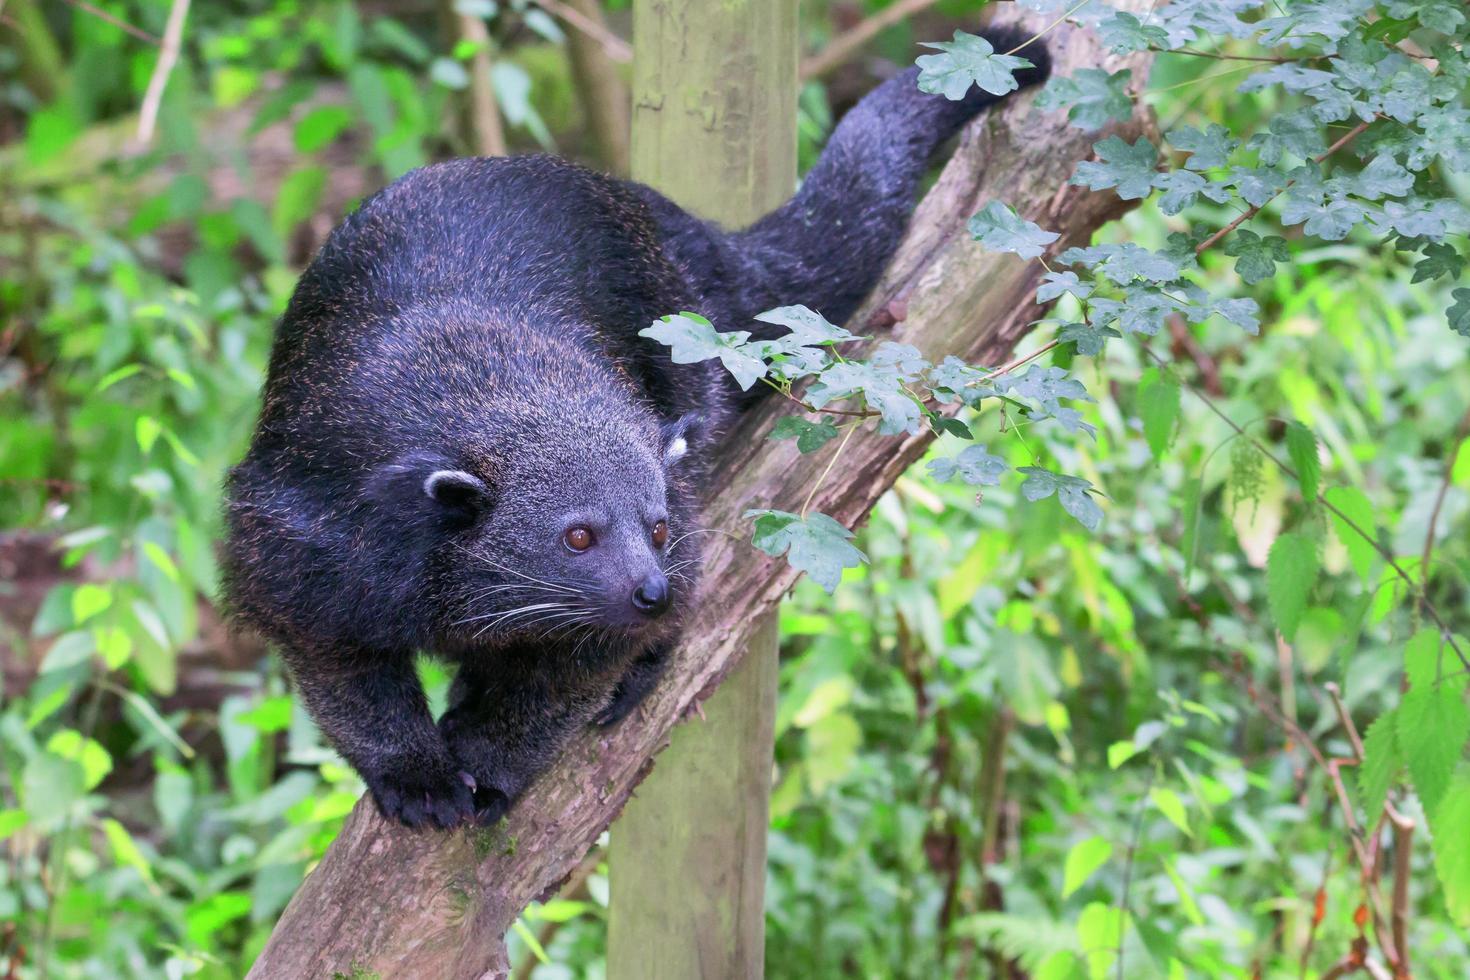 Bearcat - Binturong walking on a branch facing the camera photo